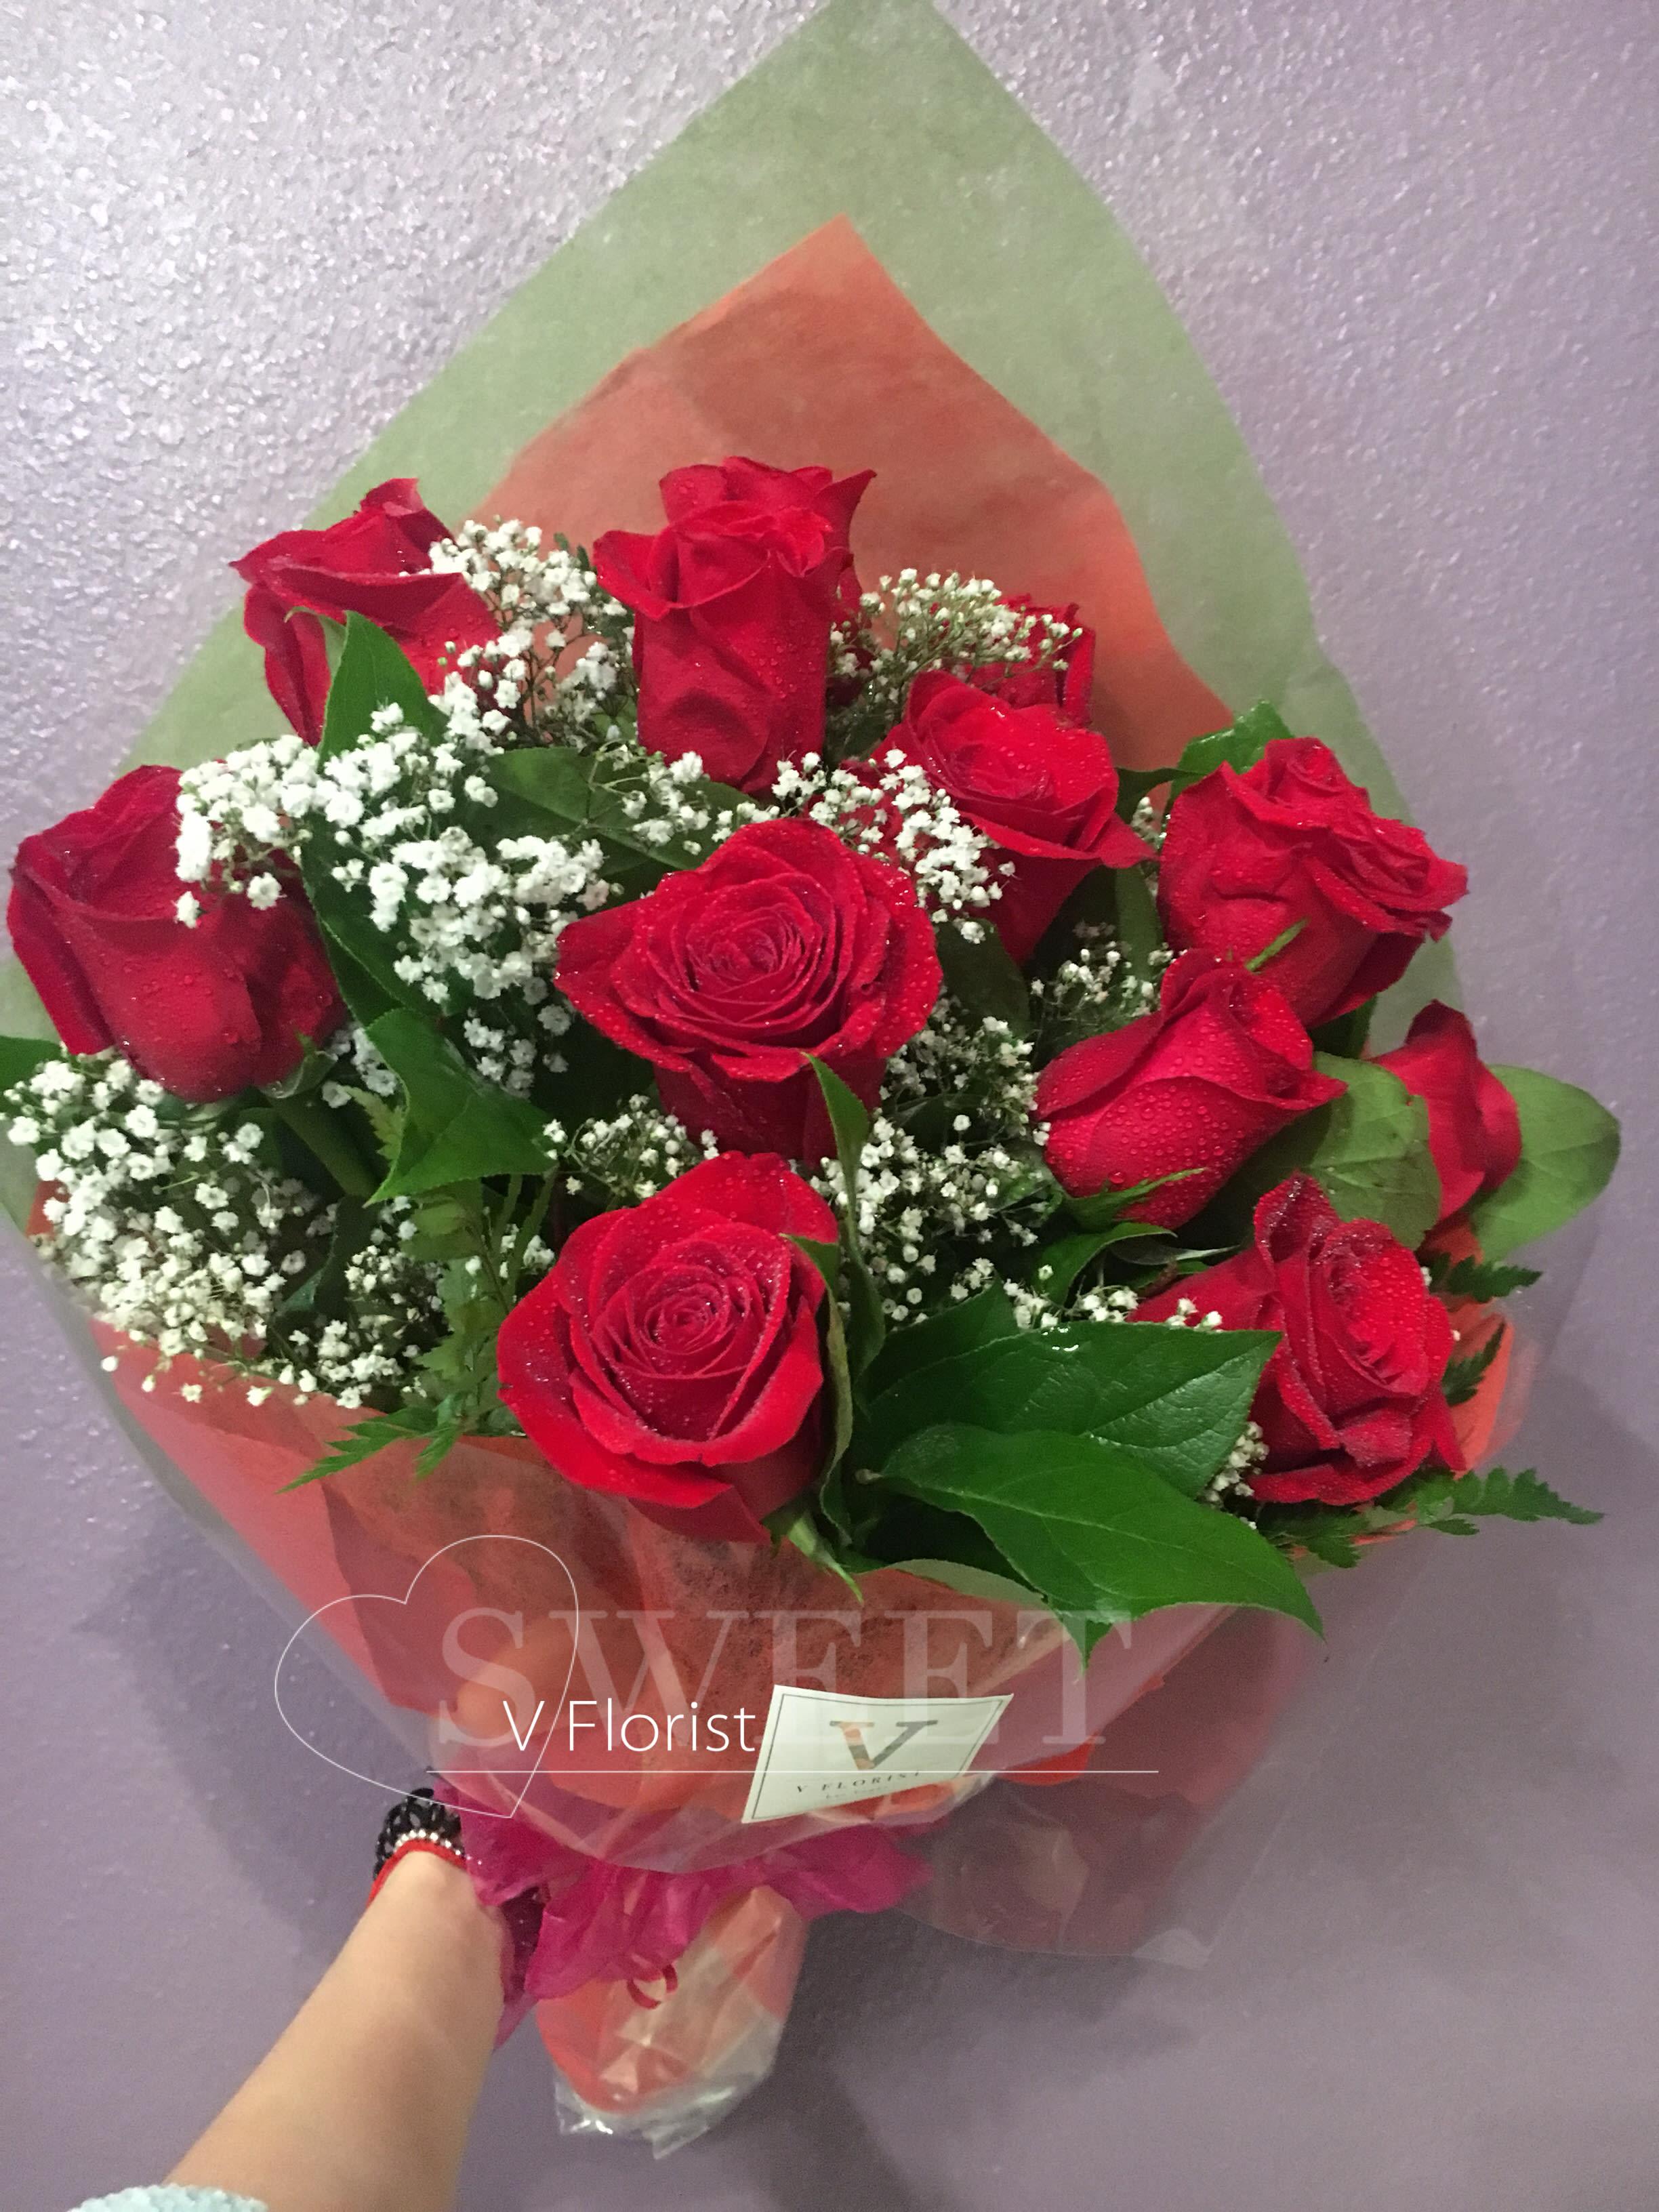 Simple Red Roses Bouquet in Las Vegas, NV | V Florist